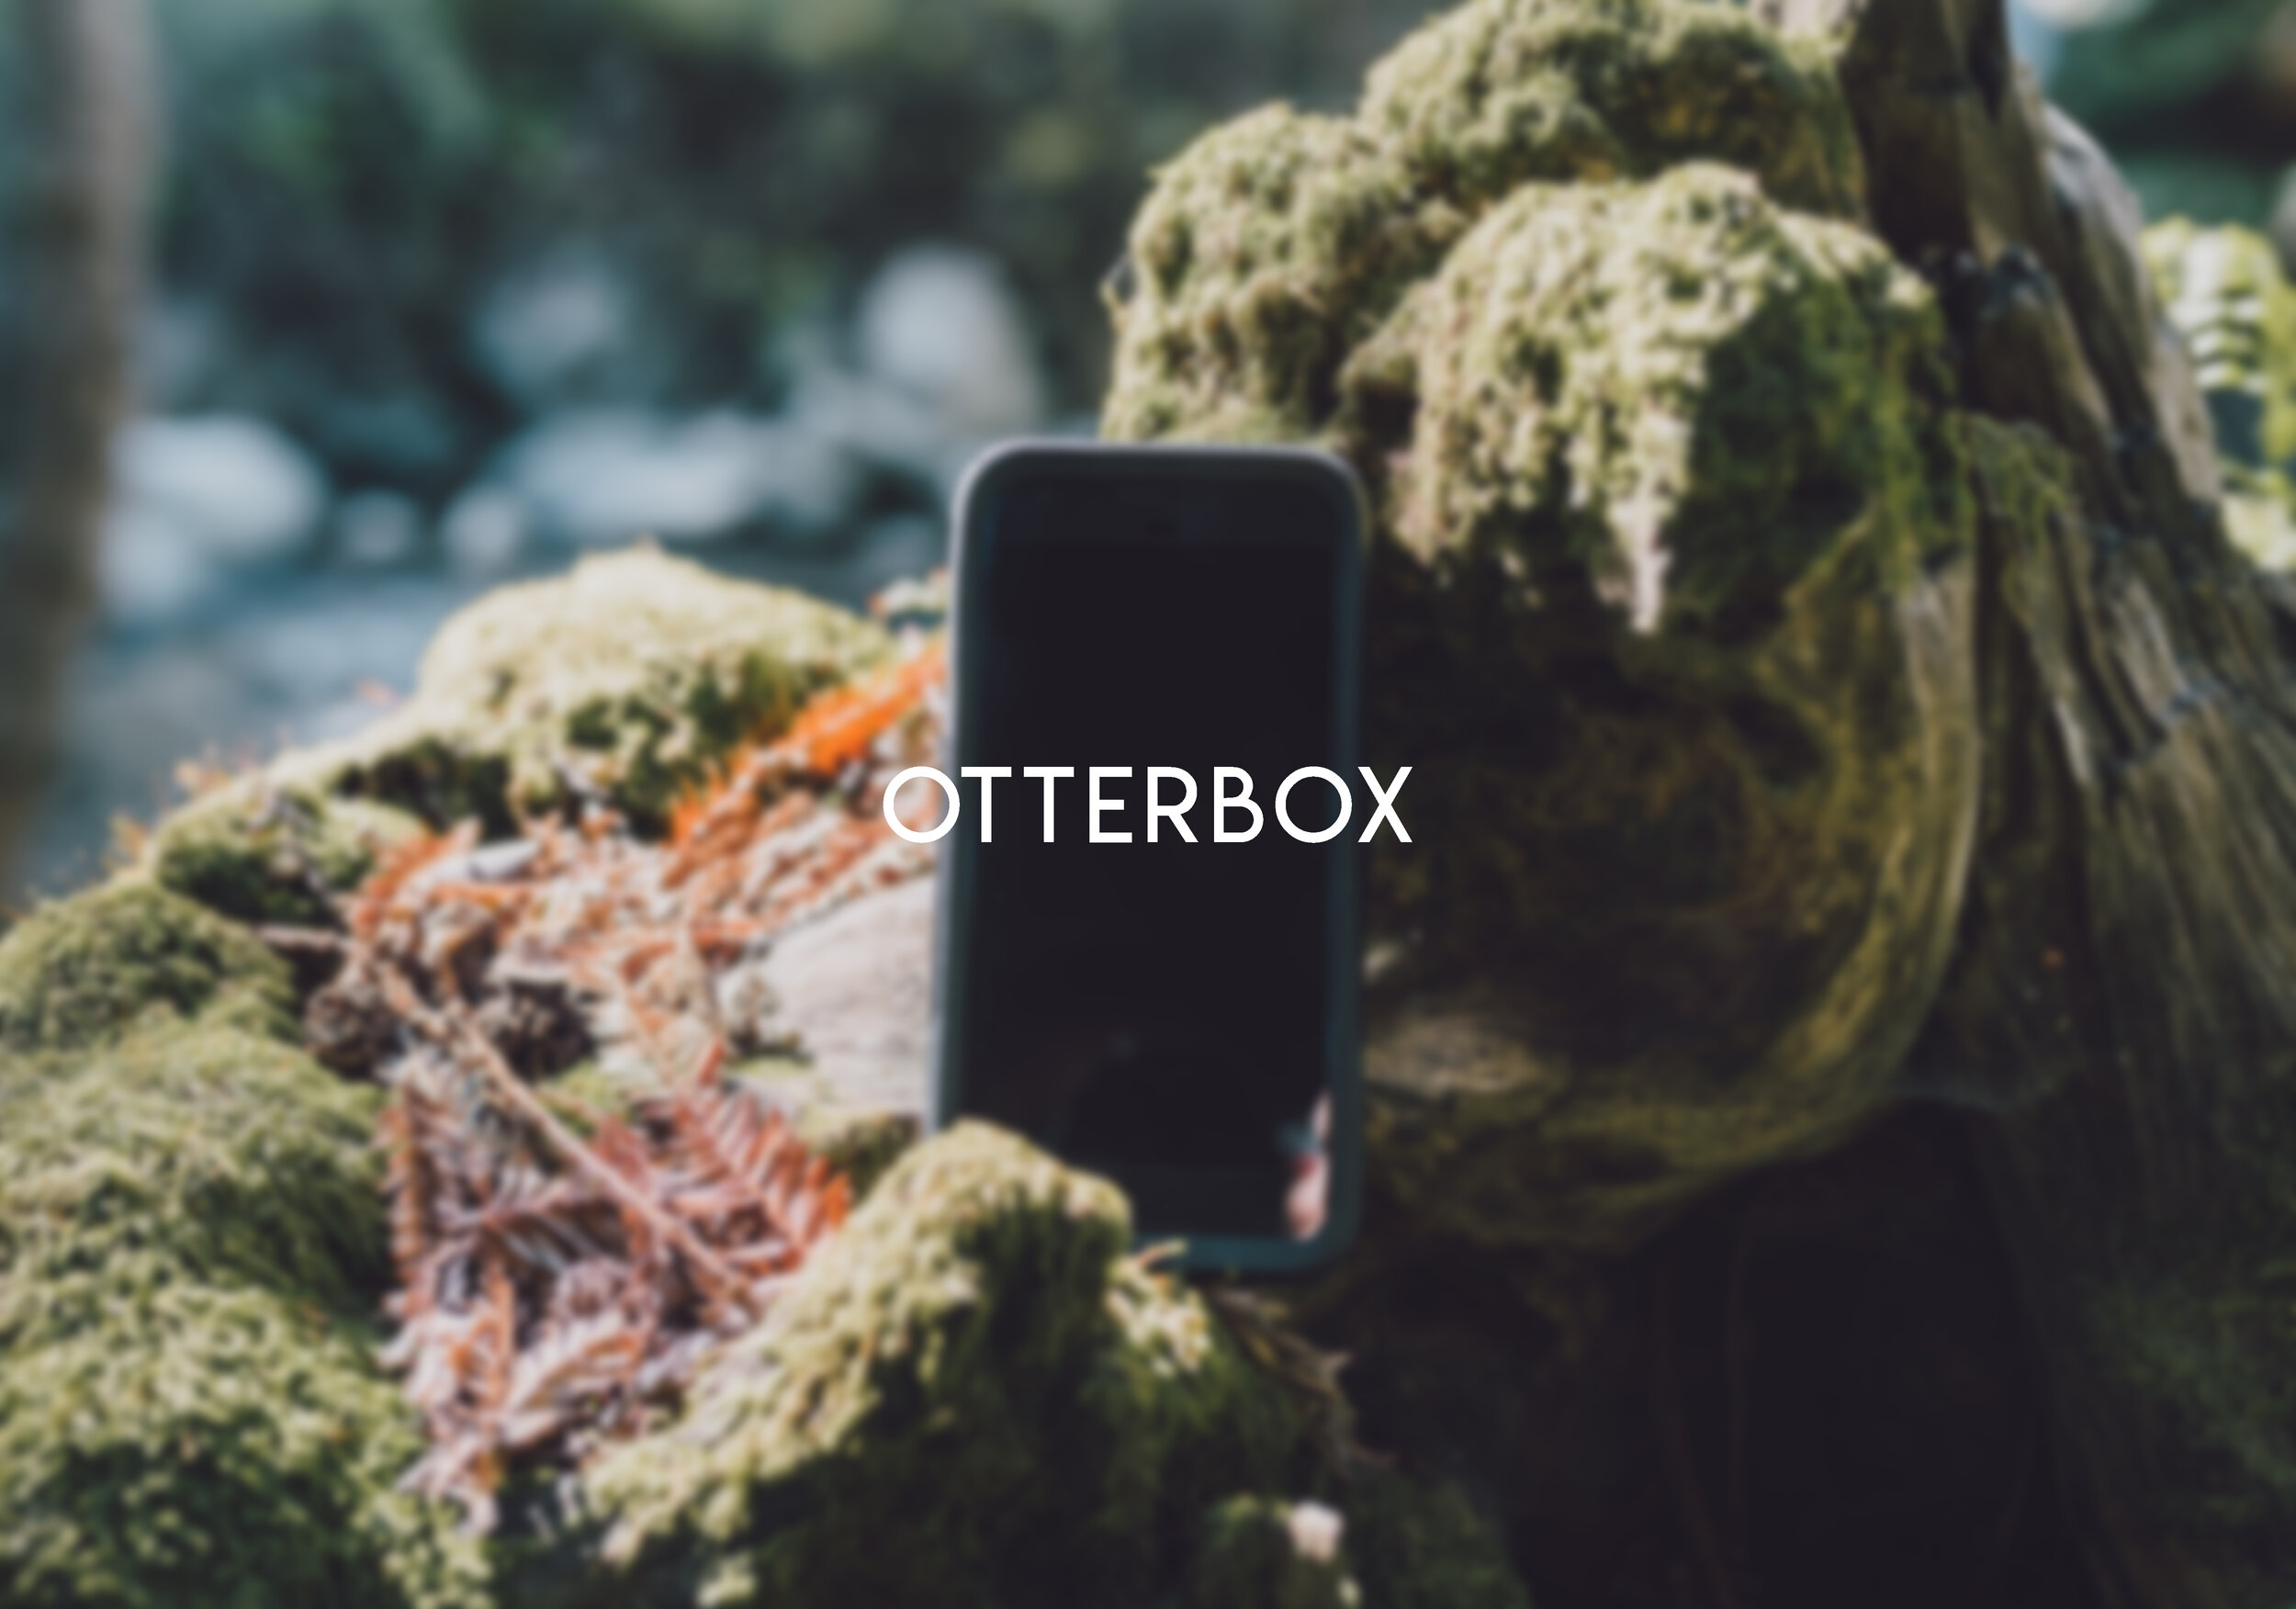 Otterbox Cover Photo.jpg